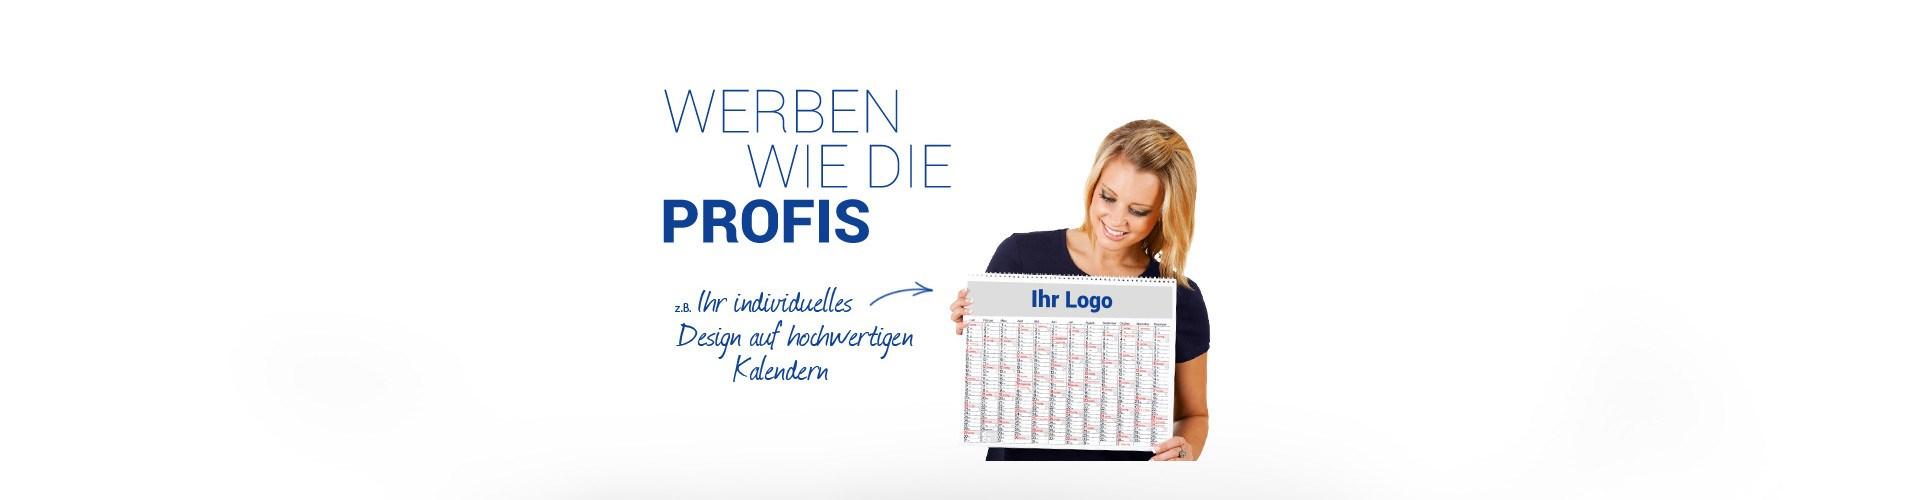 werbekalender-mit-logo